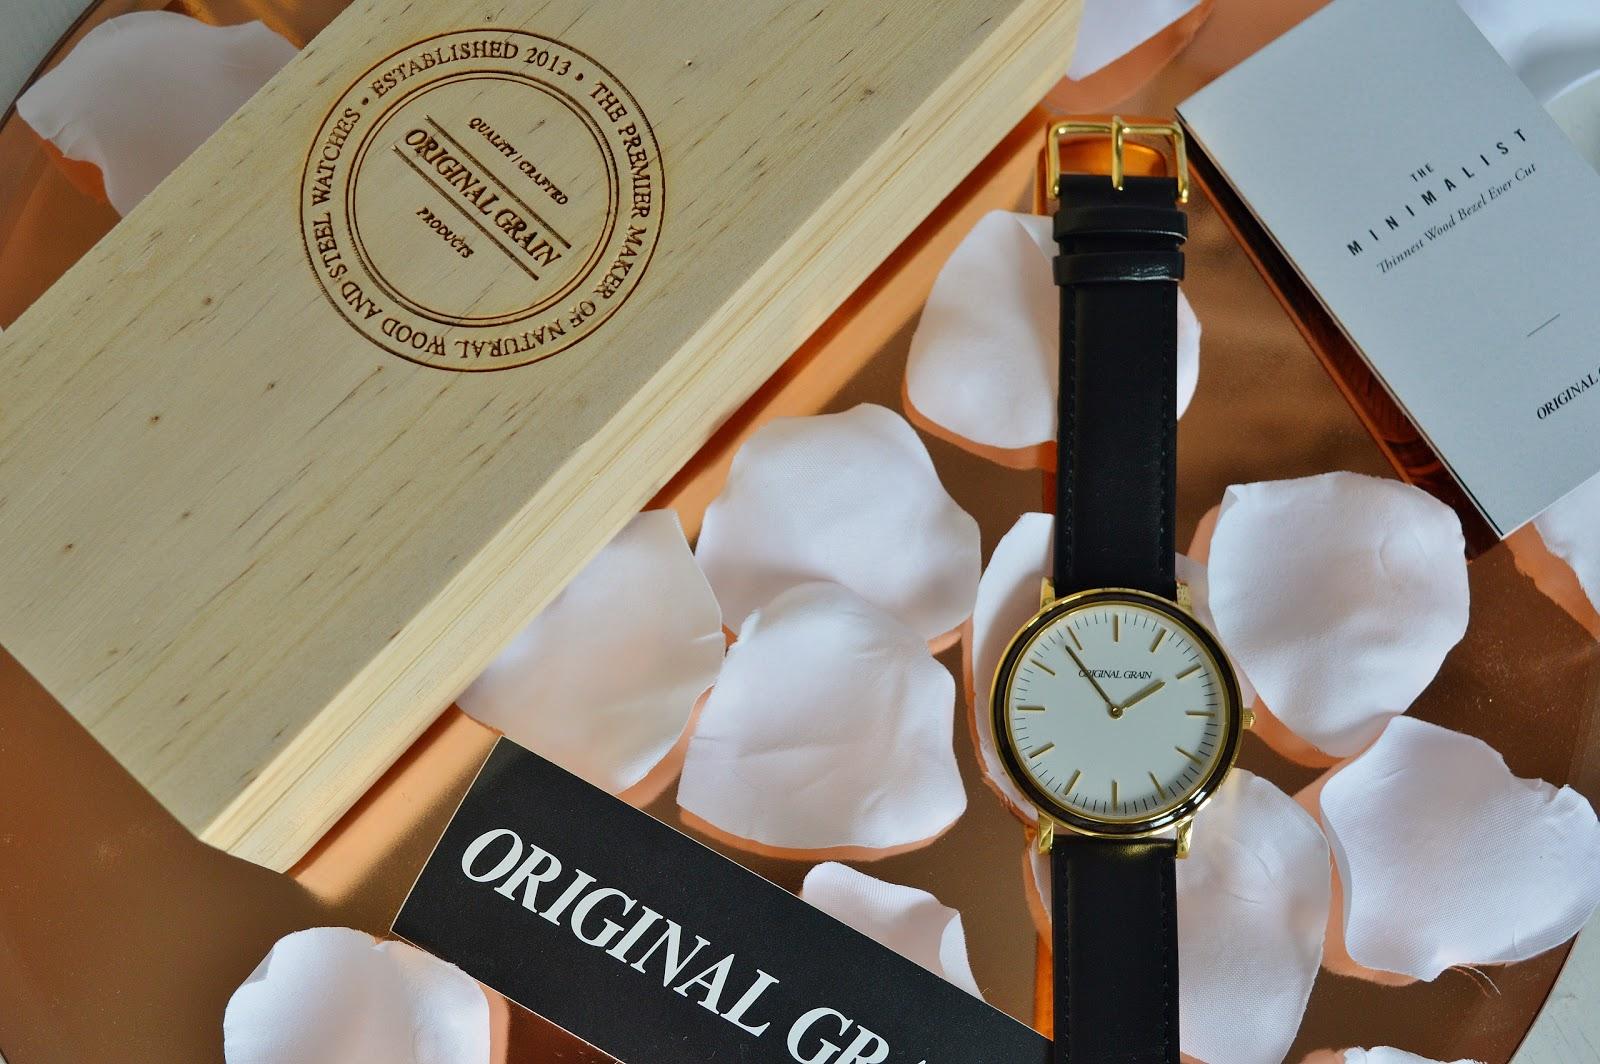 Original Grain Watches